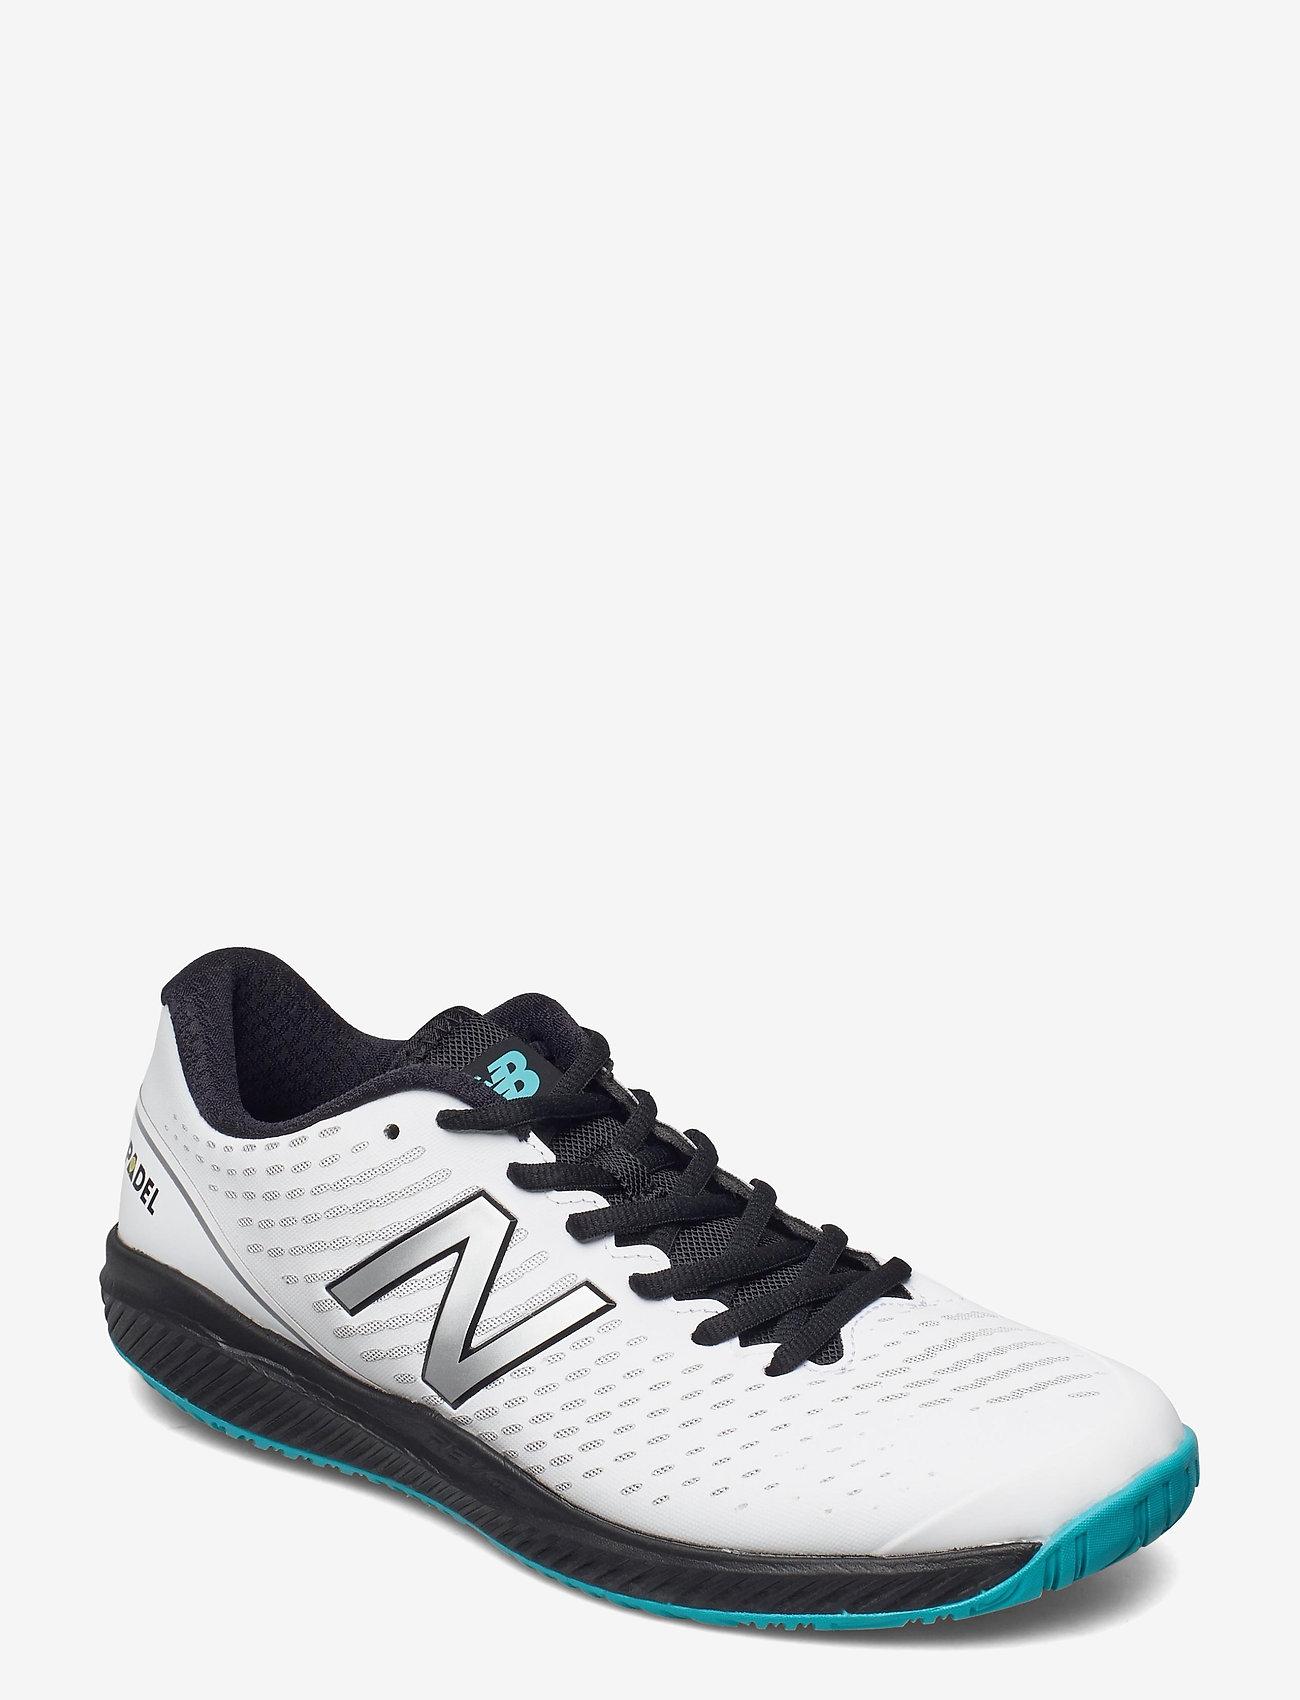 New Balance - MCH796PH - ketsjersportsko - white/black - 0